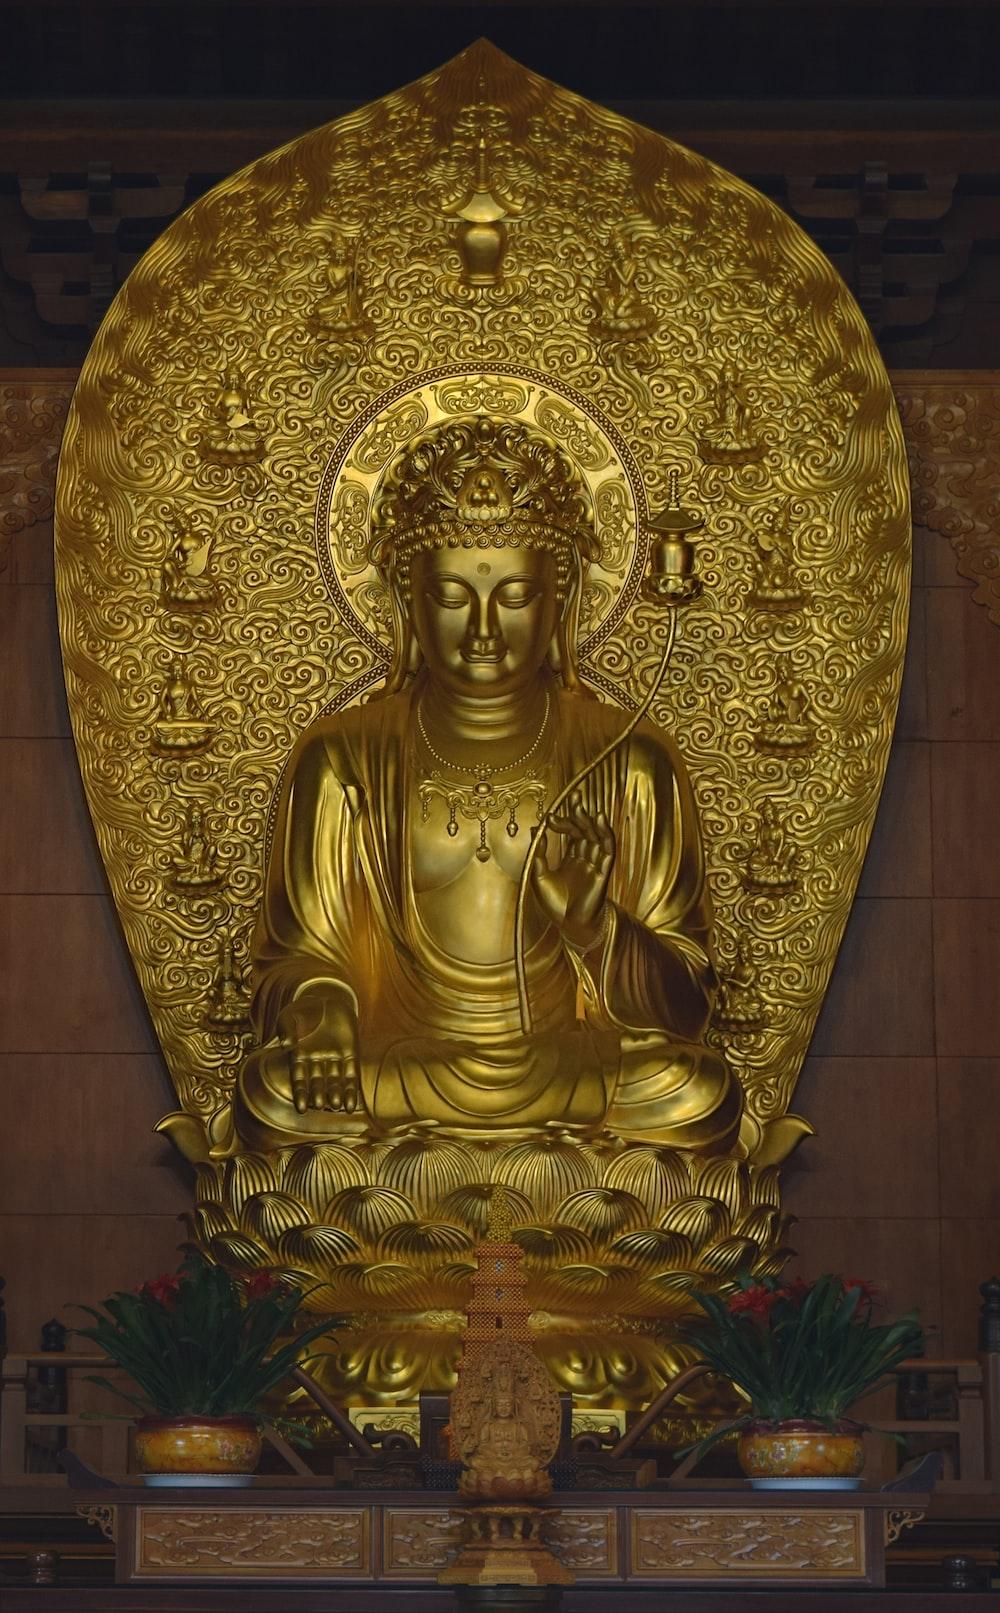 gold buddha statue on brown floor tiles